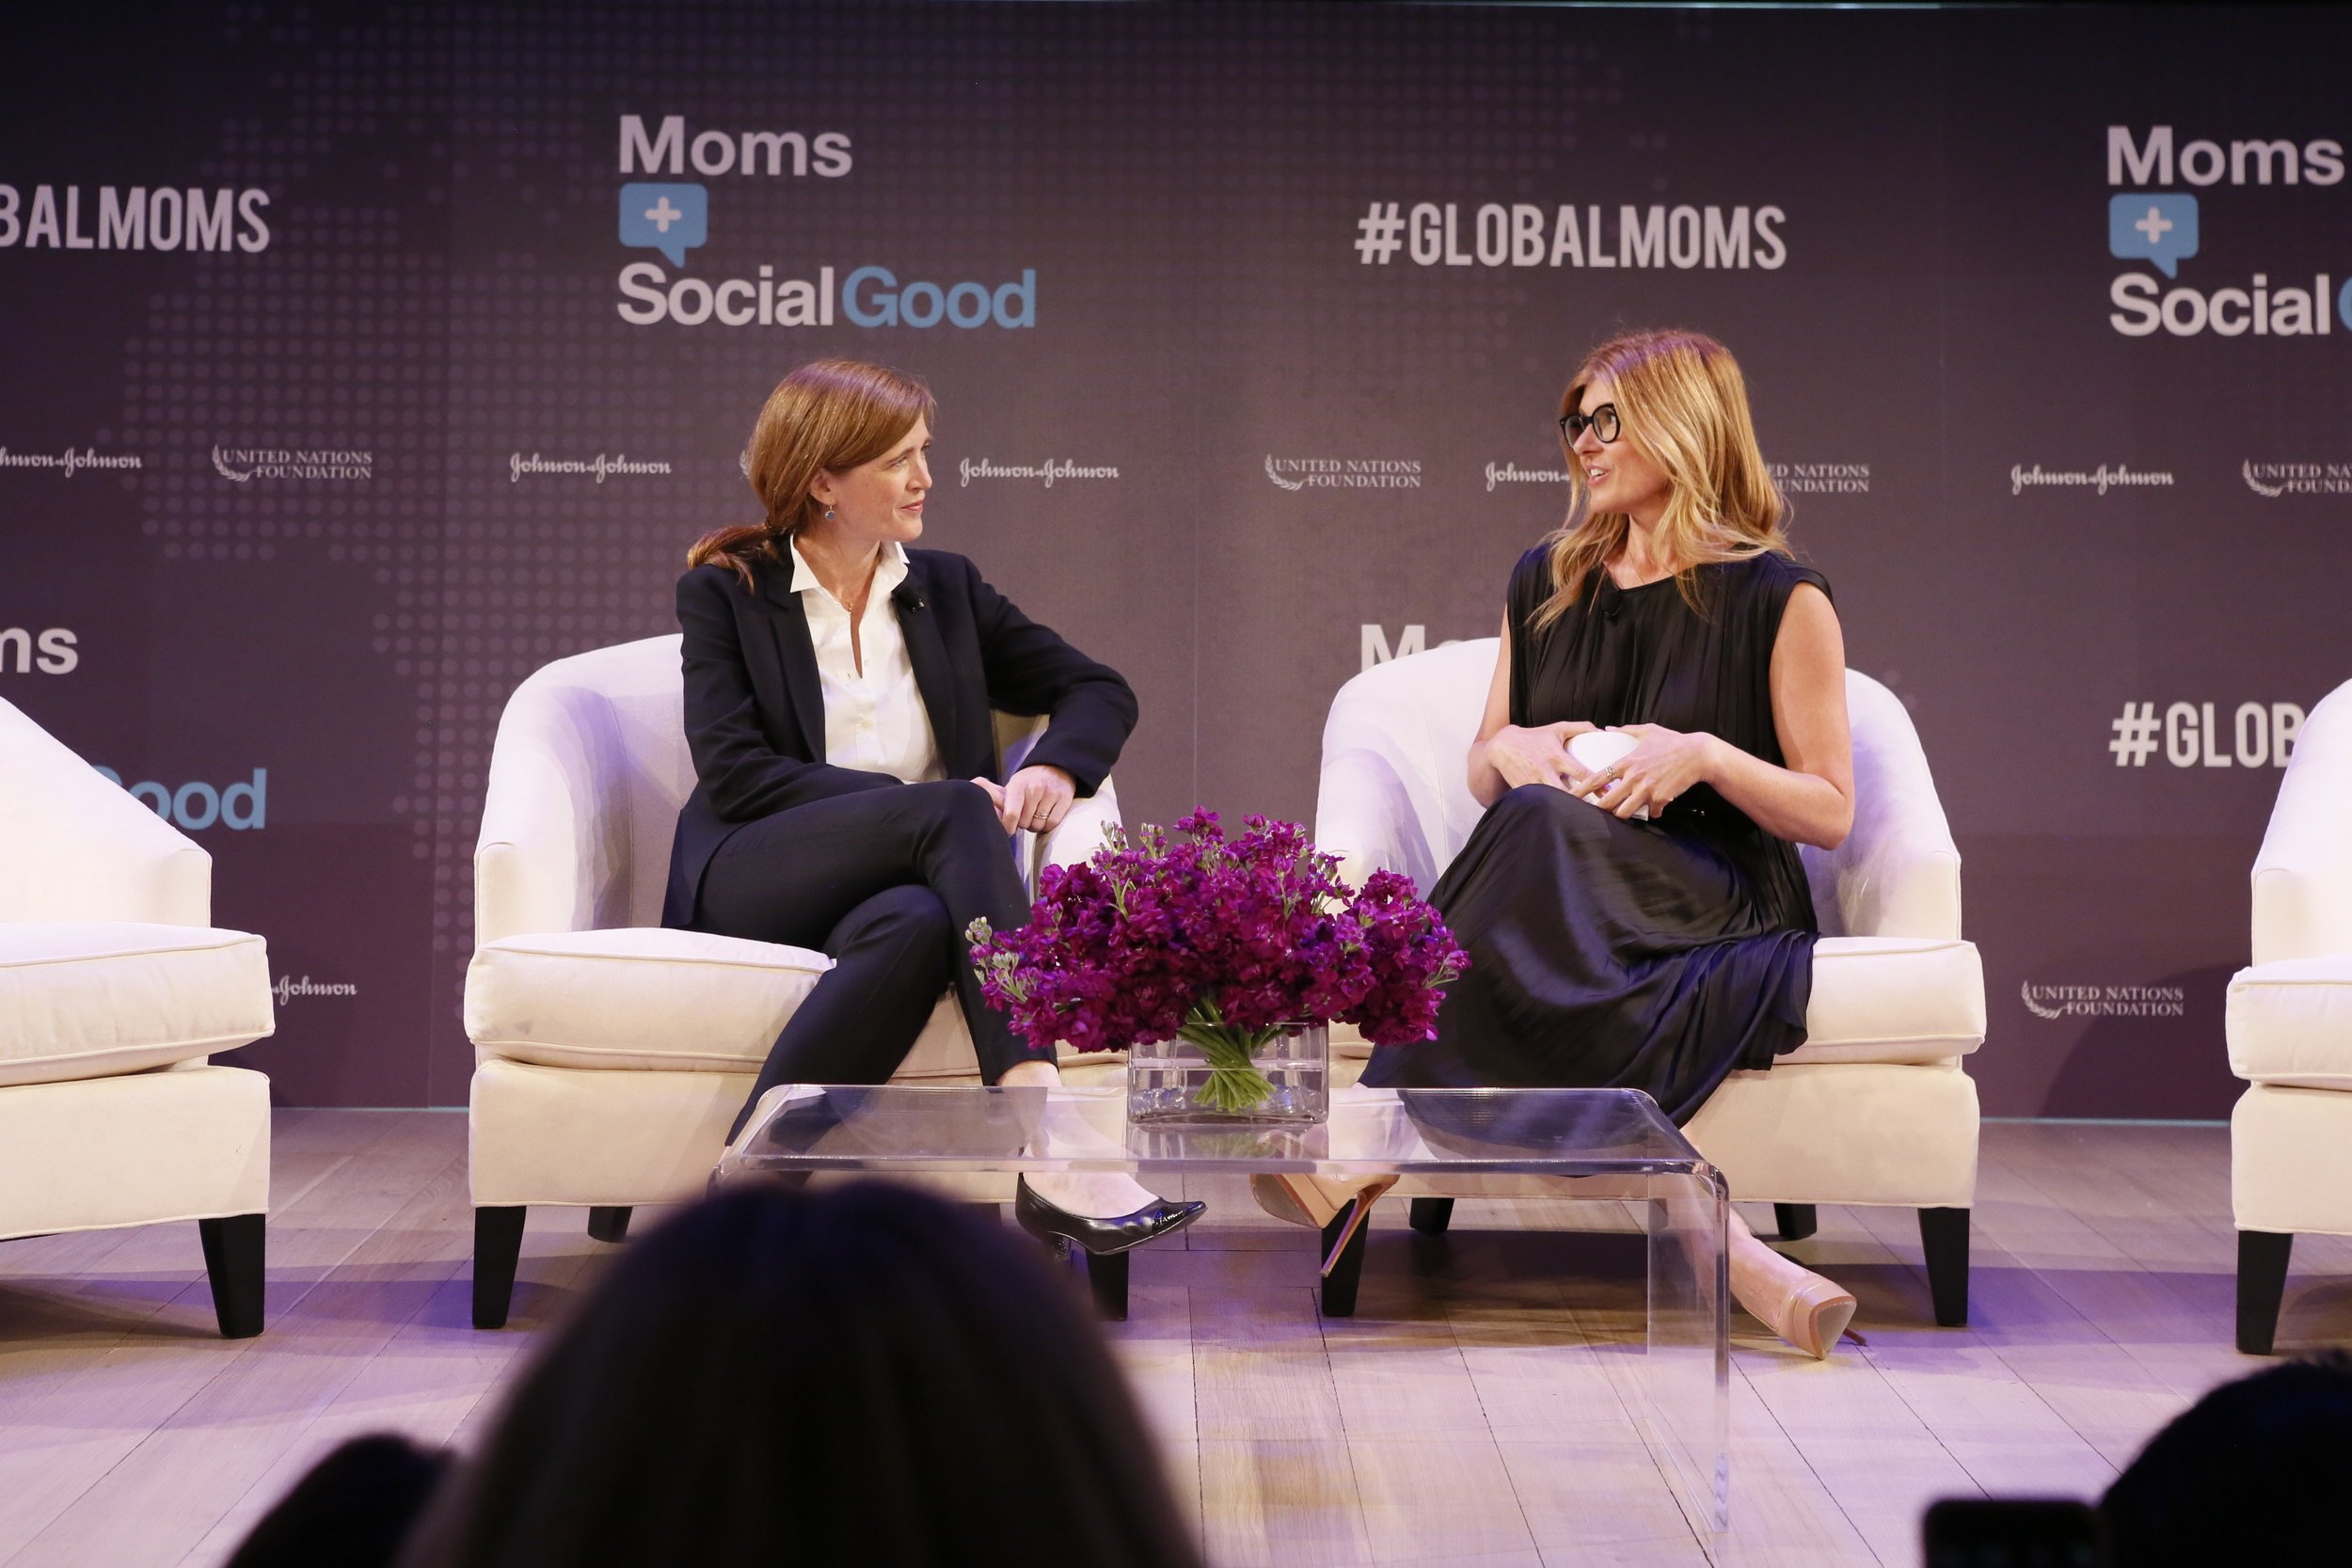 Connie Britton at UN Foundation Moms+Social Good event in NYC